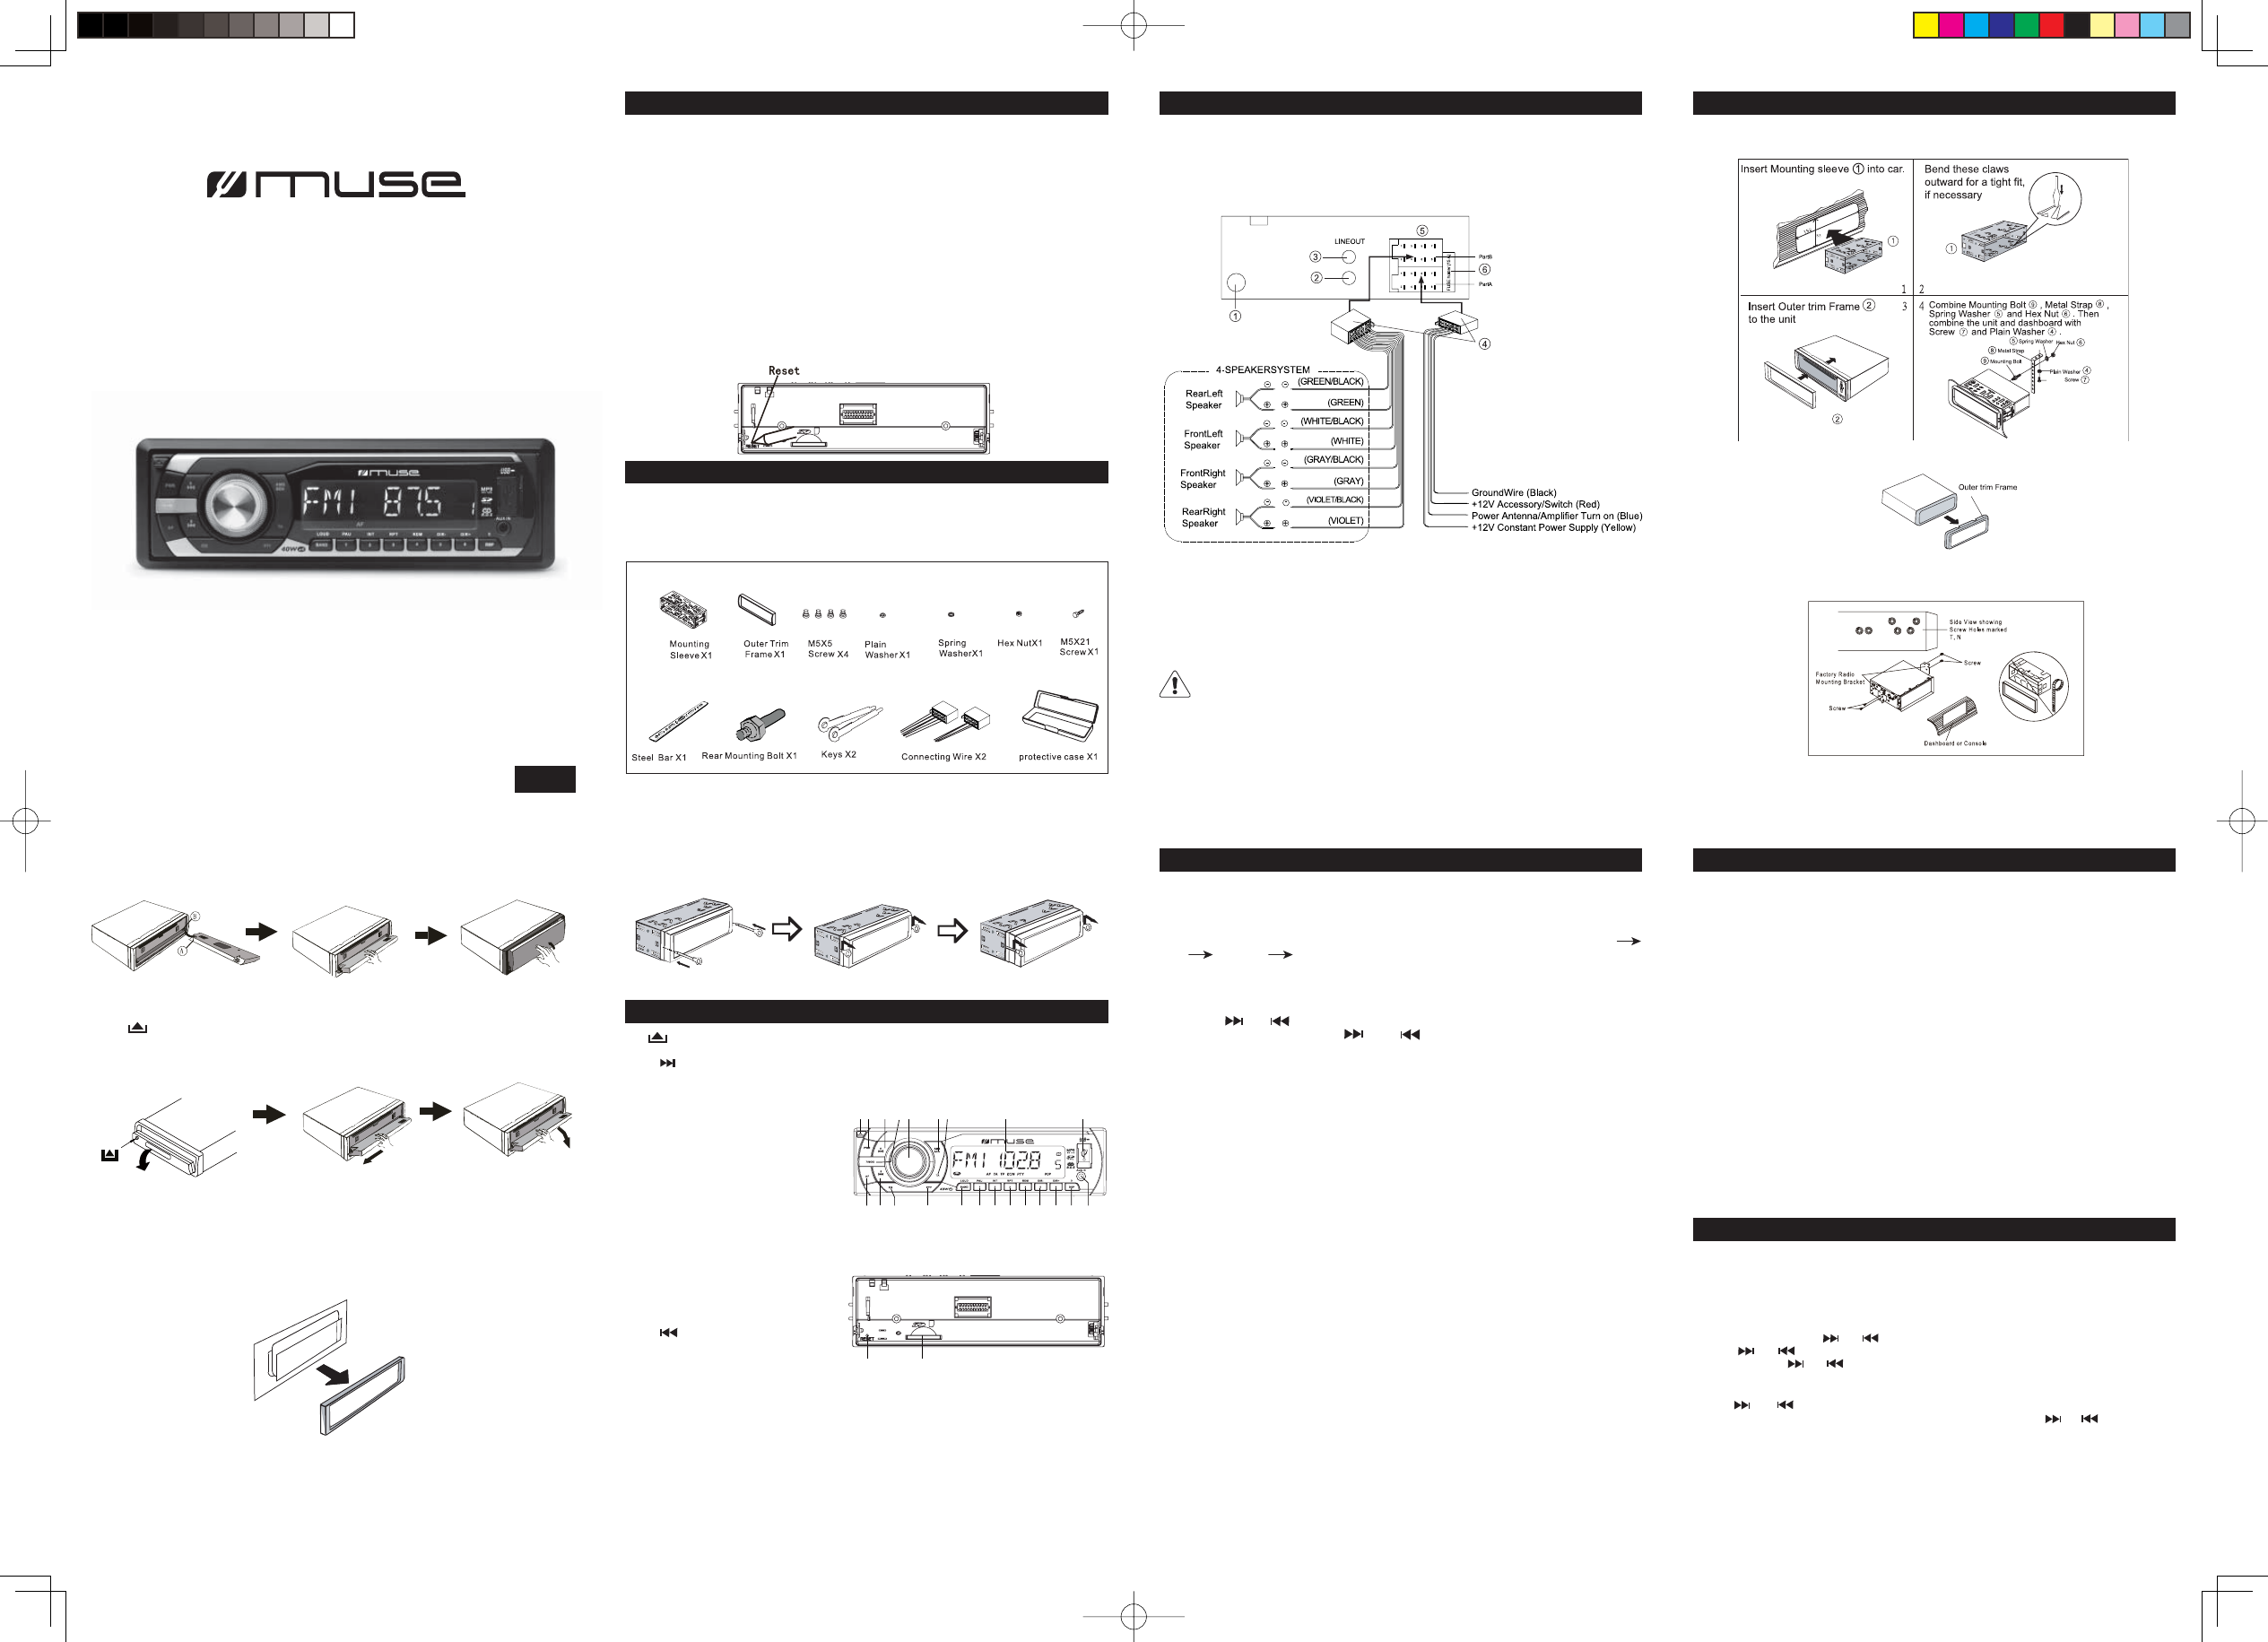 handleiding muse m 098 pagina 1 van 2 english rh gebruikershandleiding com 3-Way Switch Wiring Diagram Basic Electrical Schematic Diagrams